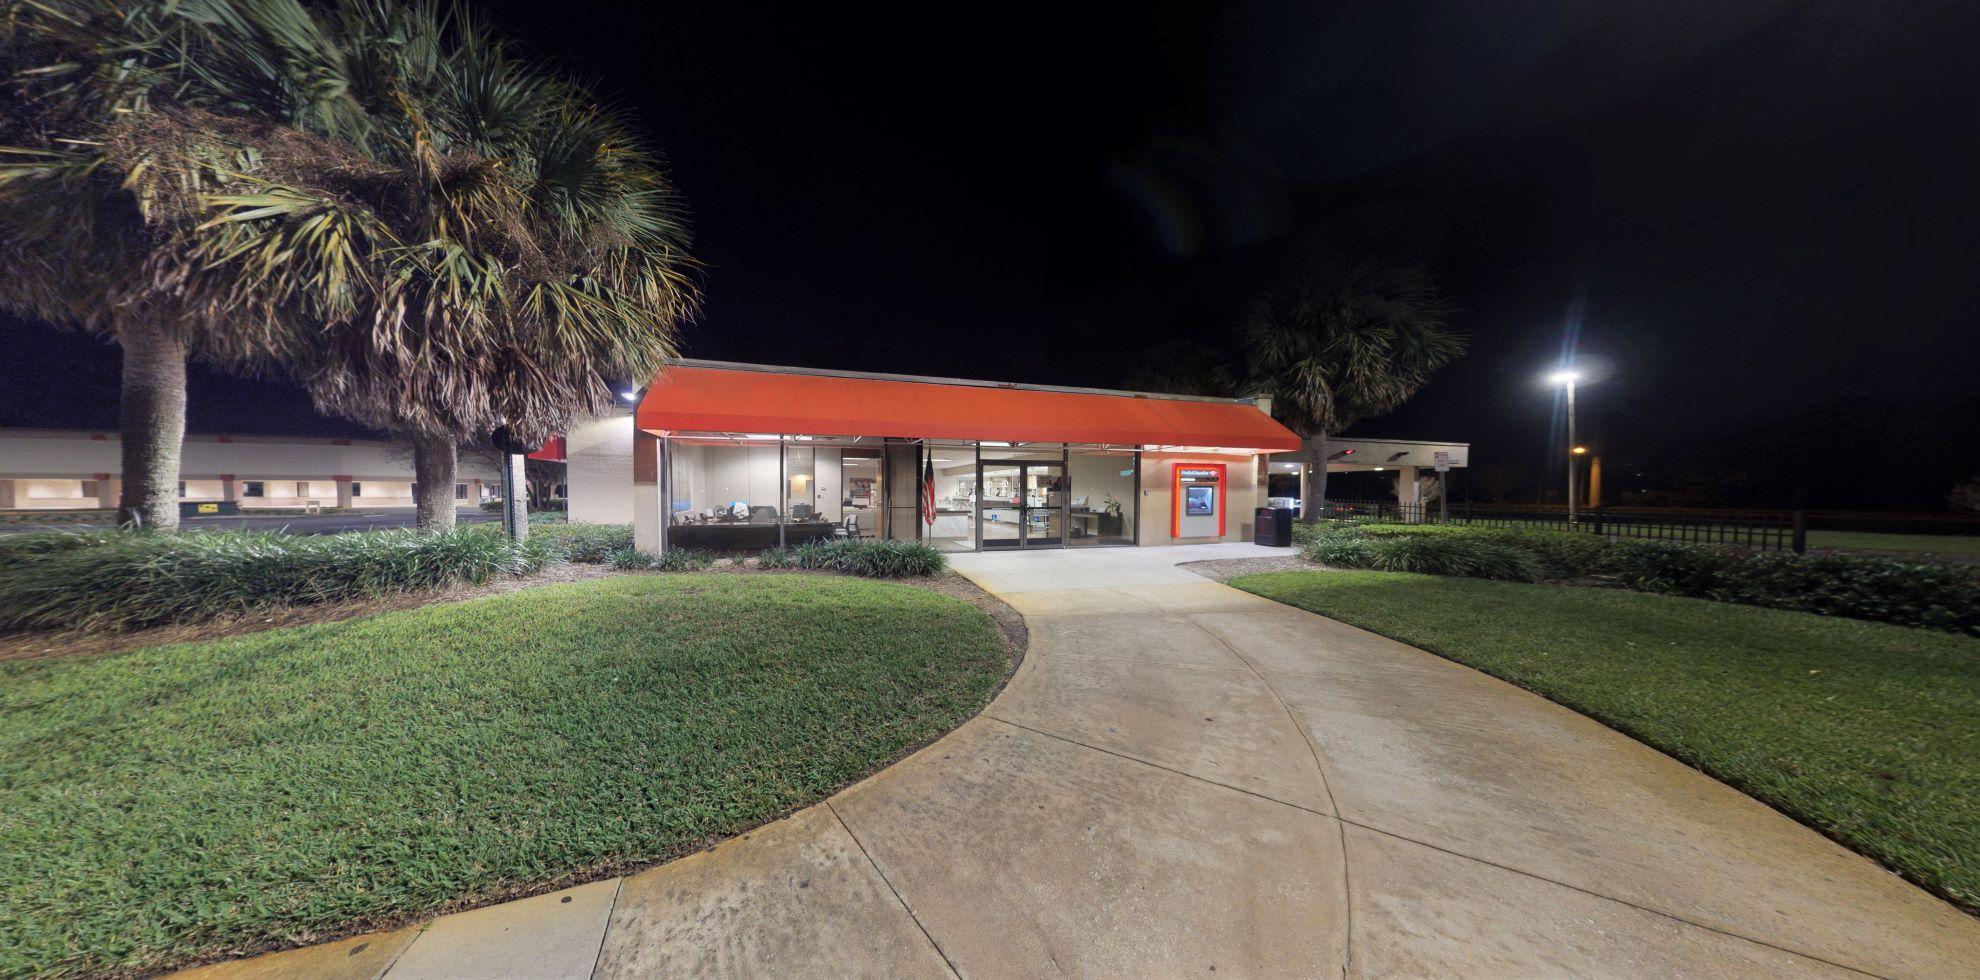 Bank of America financial center with drive-thru ATM | 10900 Orangewood Blvd, Orlando, FL 32821